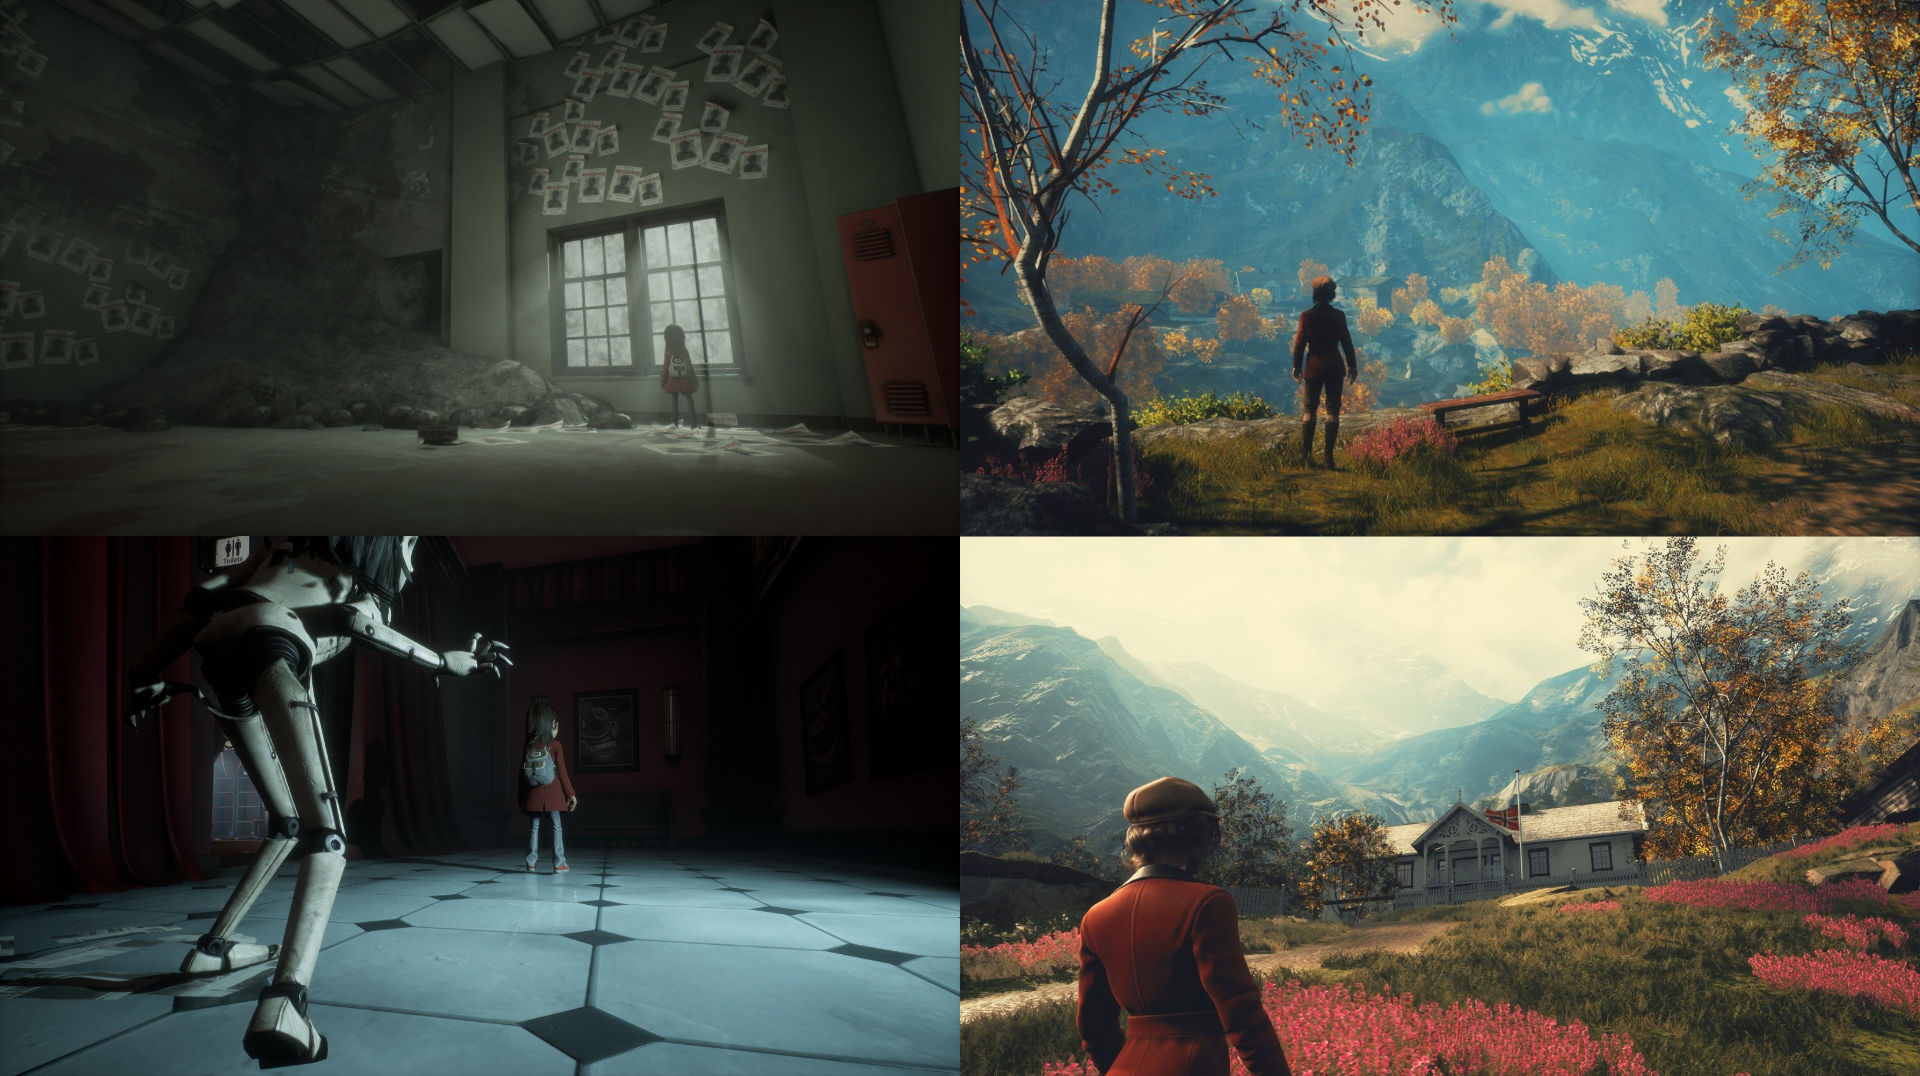 Screenshots of games: left Gylt, right Draugen